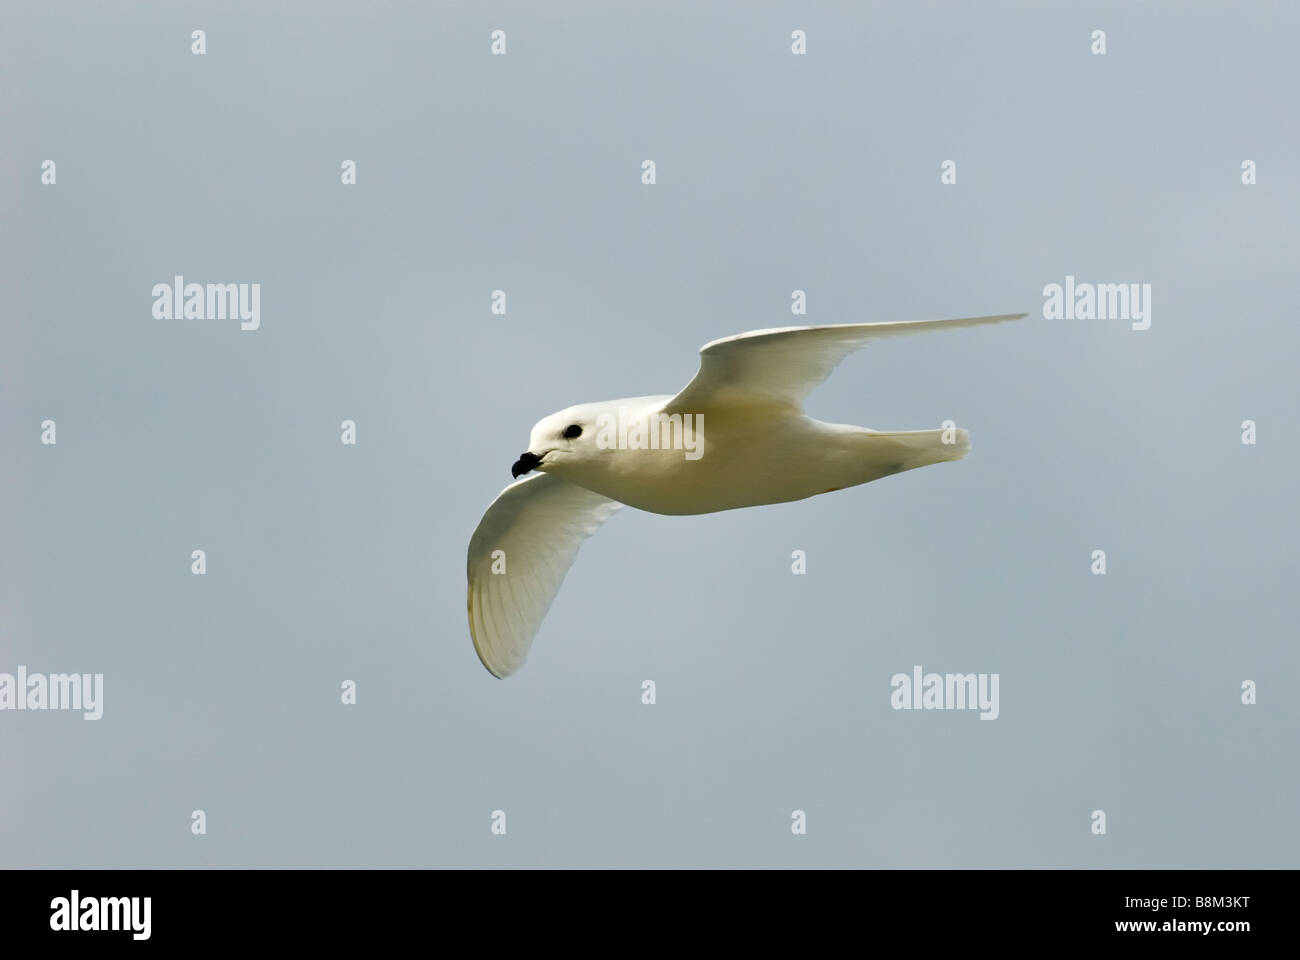 Snow petrel (Pagodroma nivea) in flight, Ross Sea, Antarctica. - Stock Image